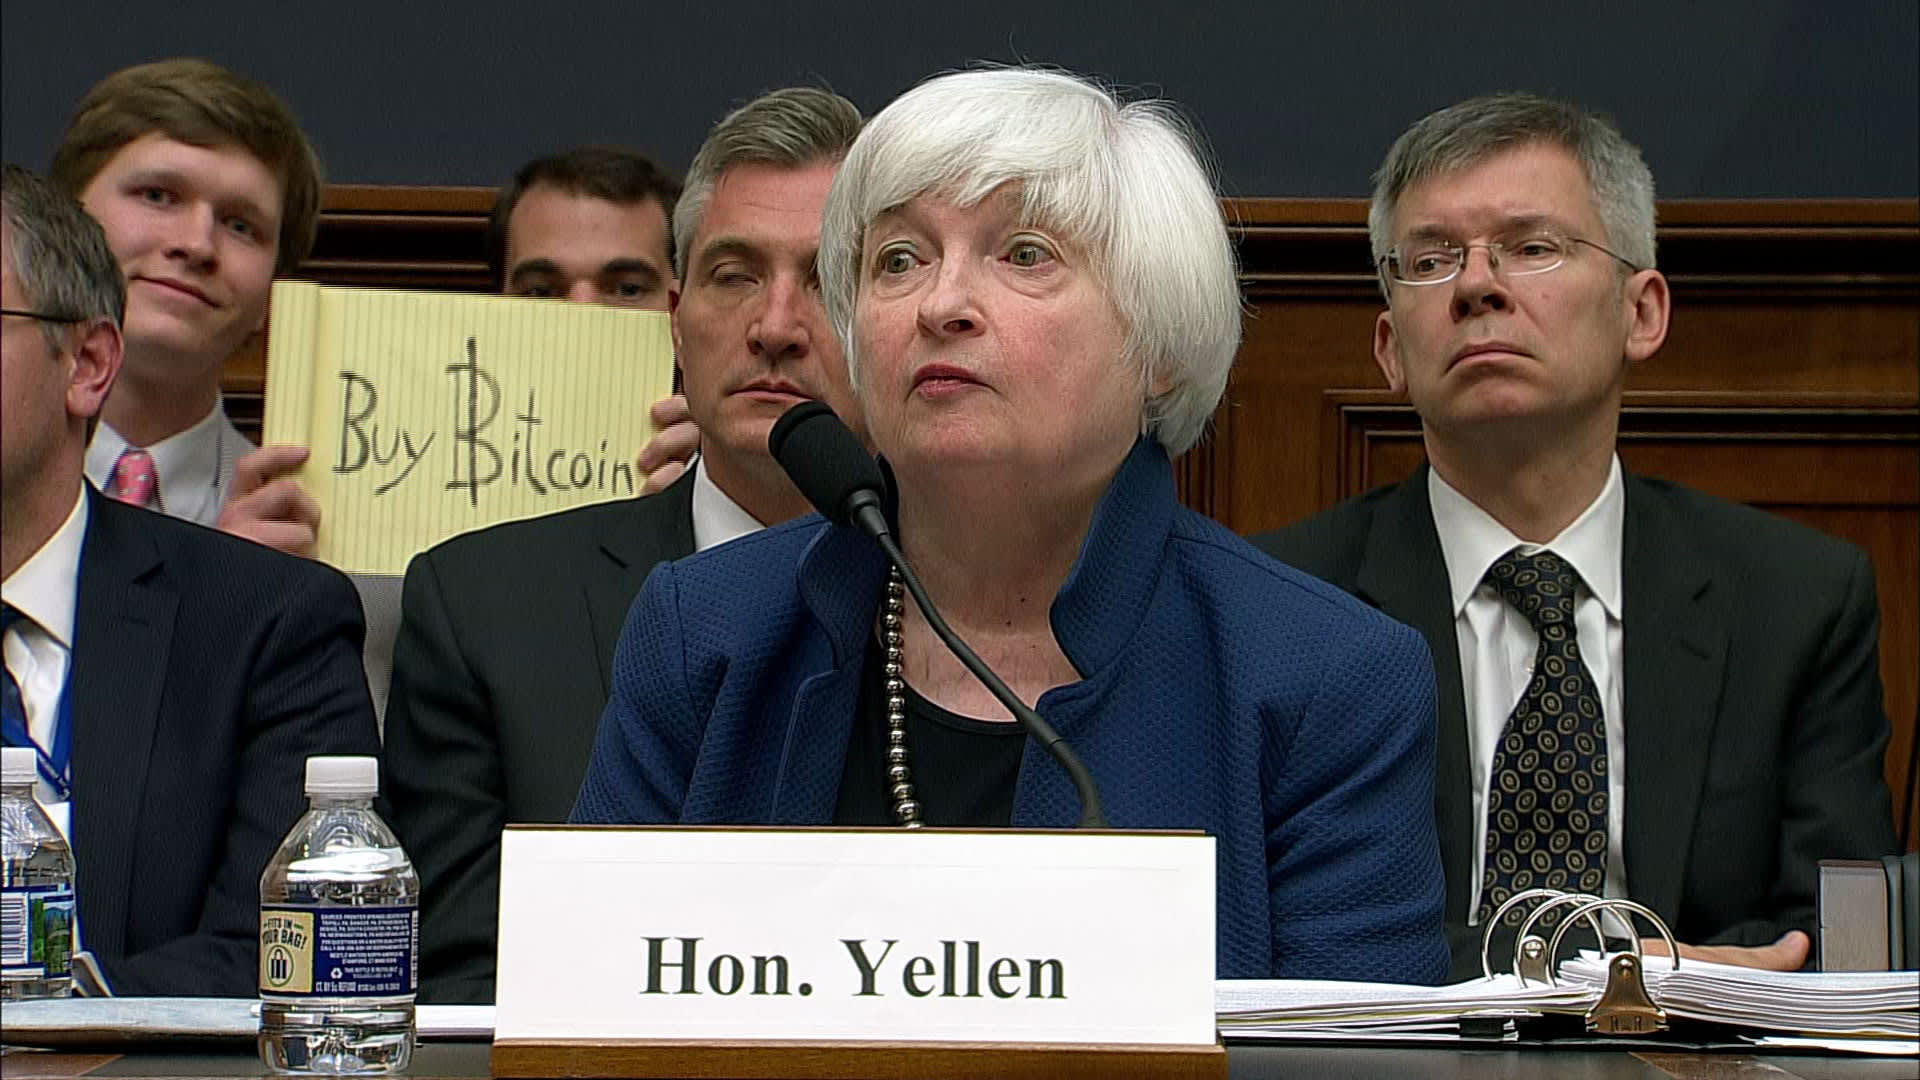 104582262 Yellen bitcoin